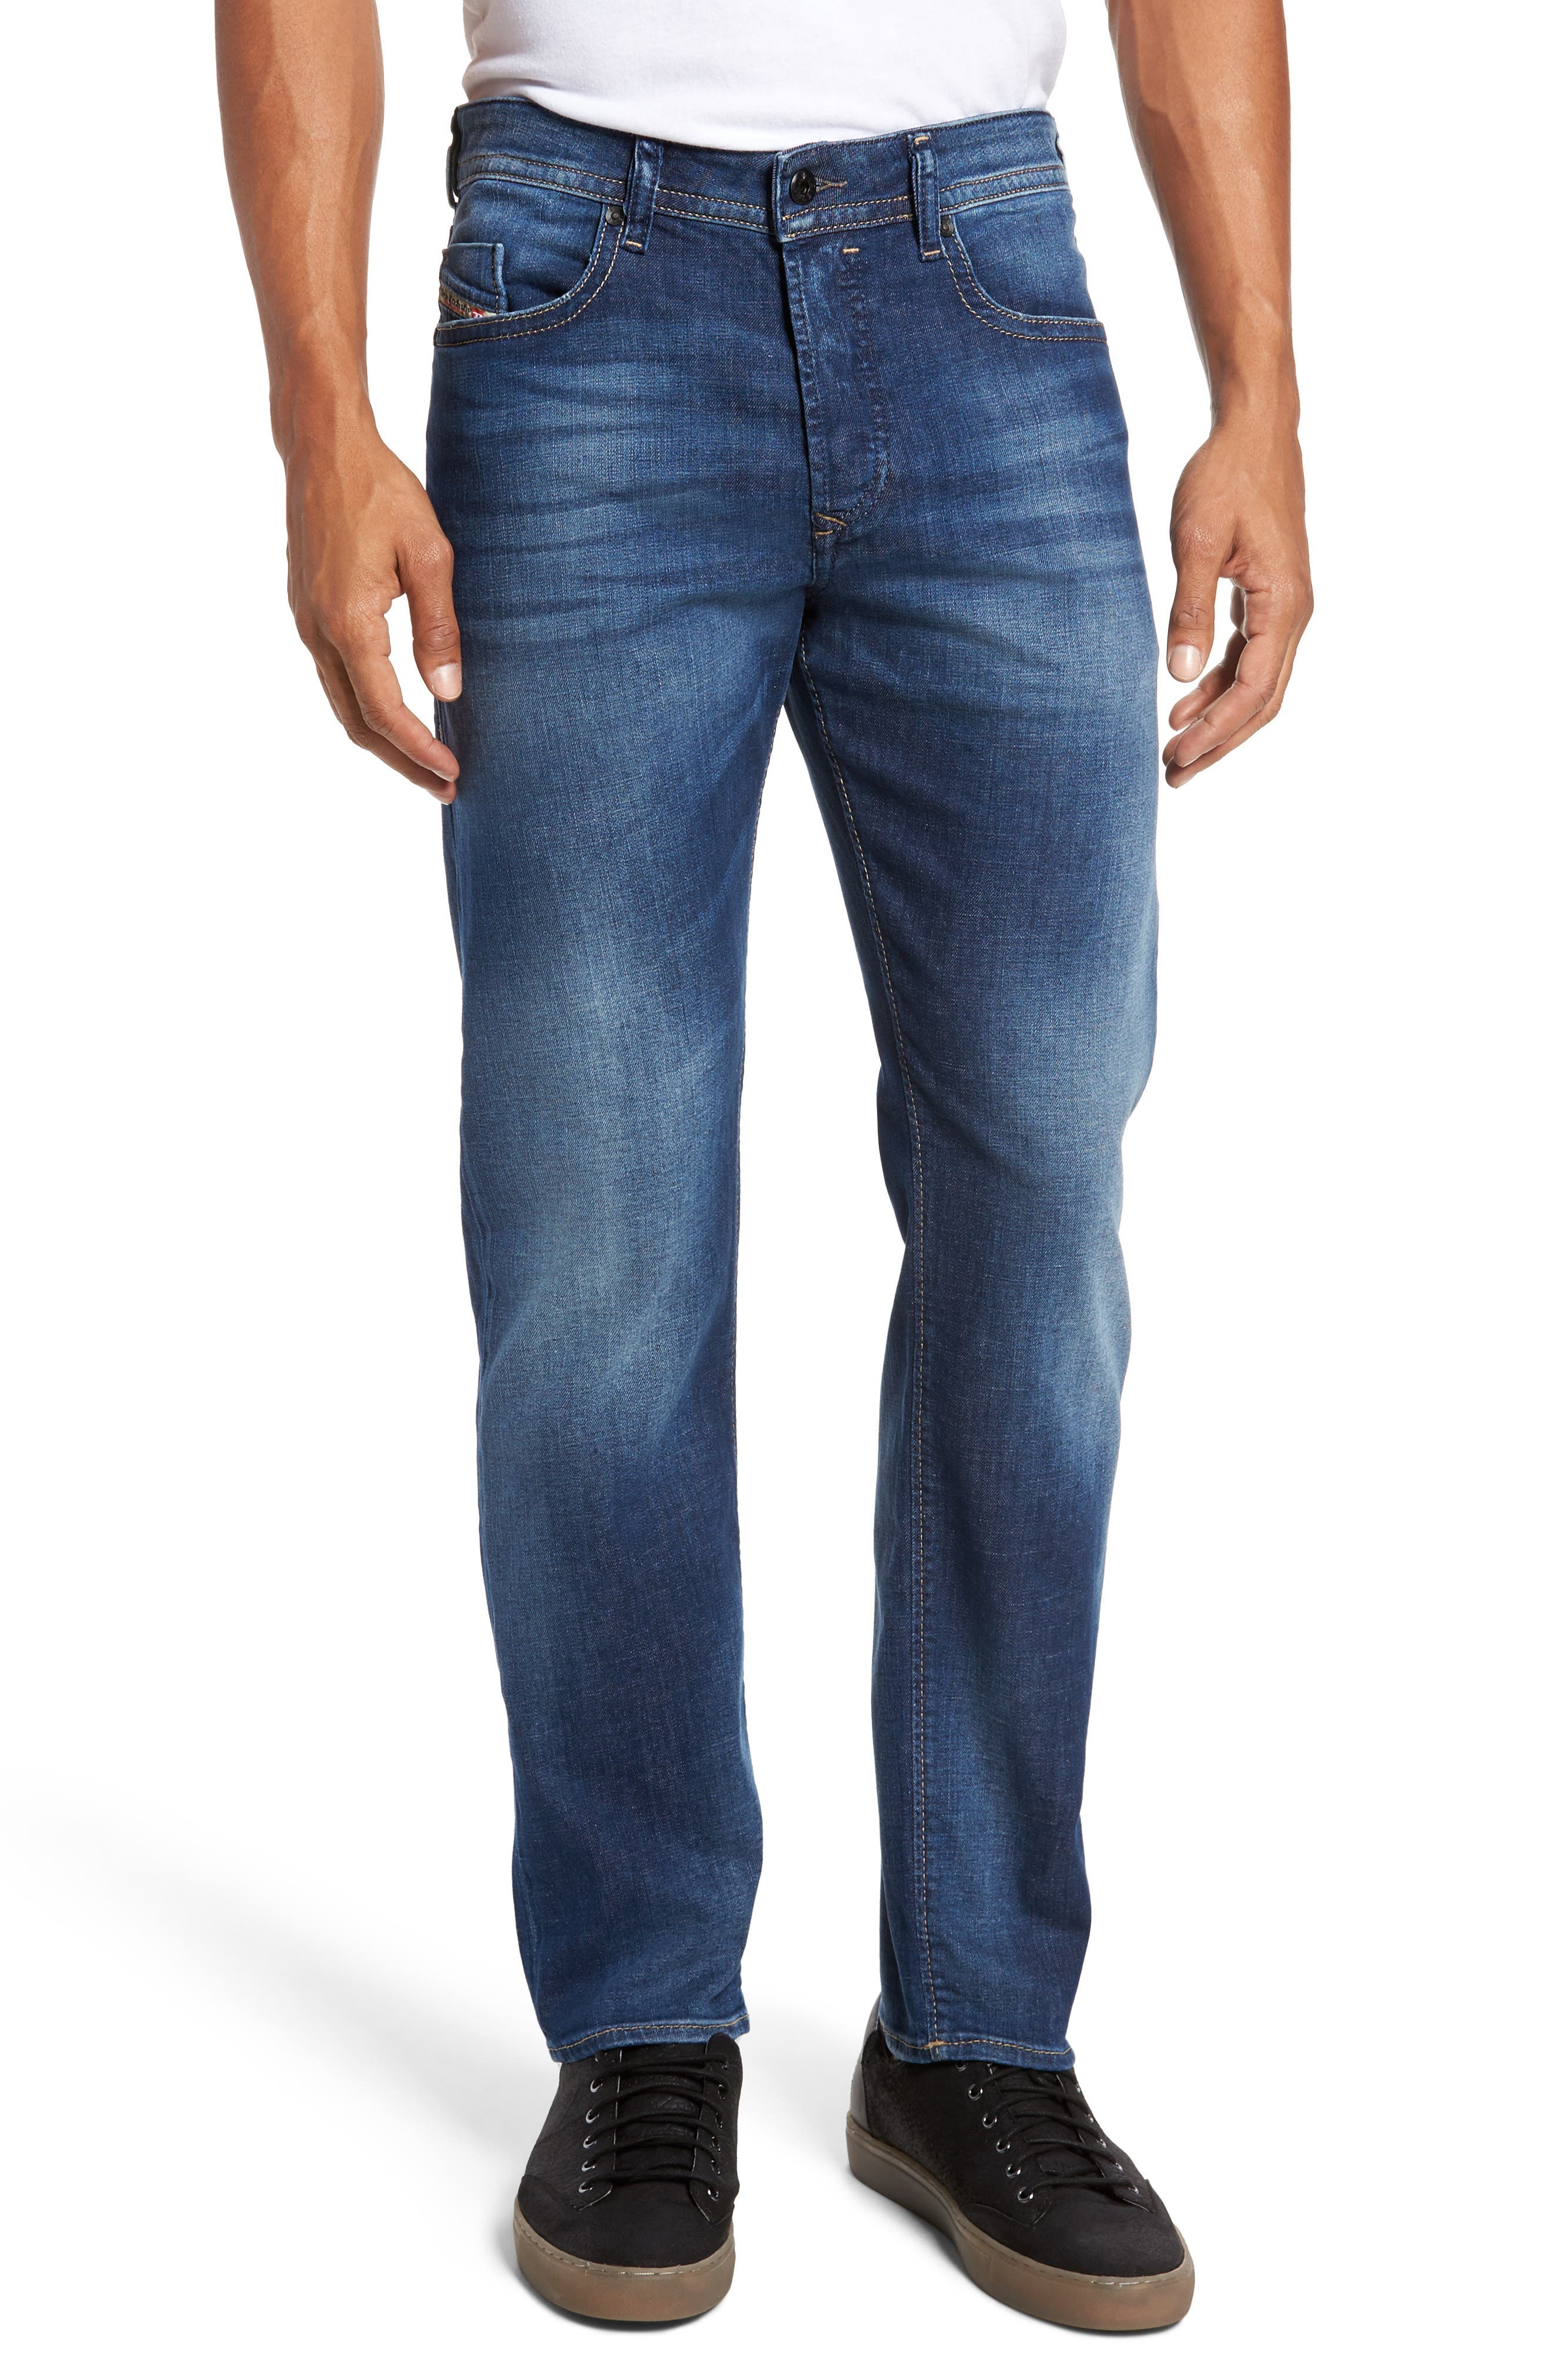 Alternate Image 1 Selected - DIESEL® Buster Slim Straight Leg Jeans (084GR)